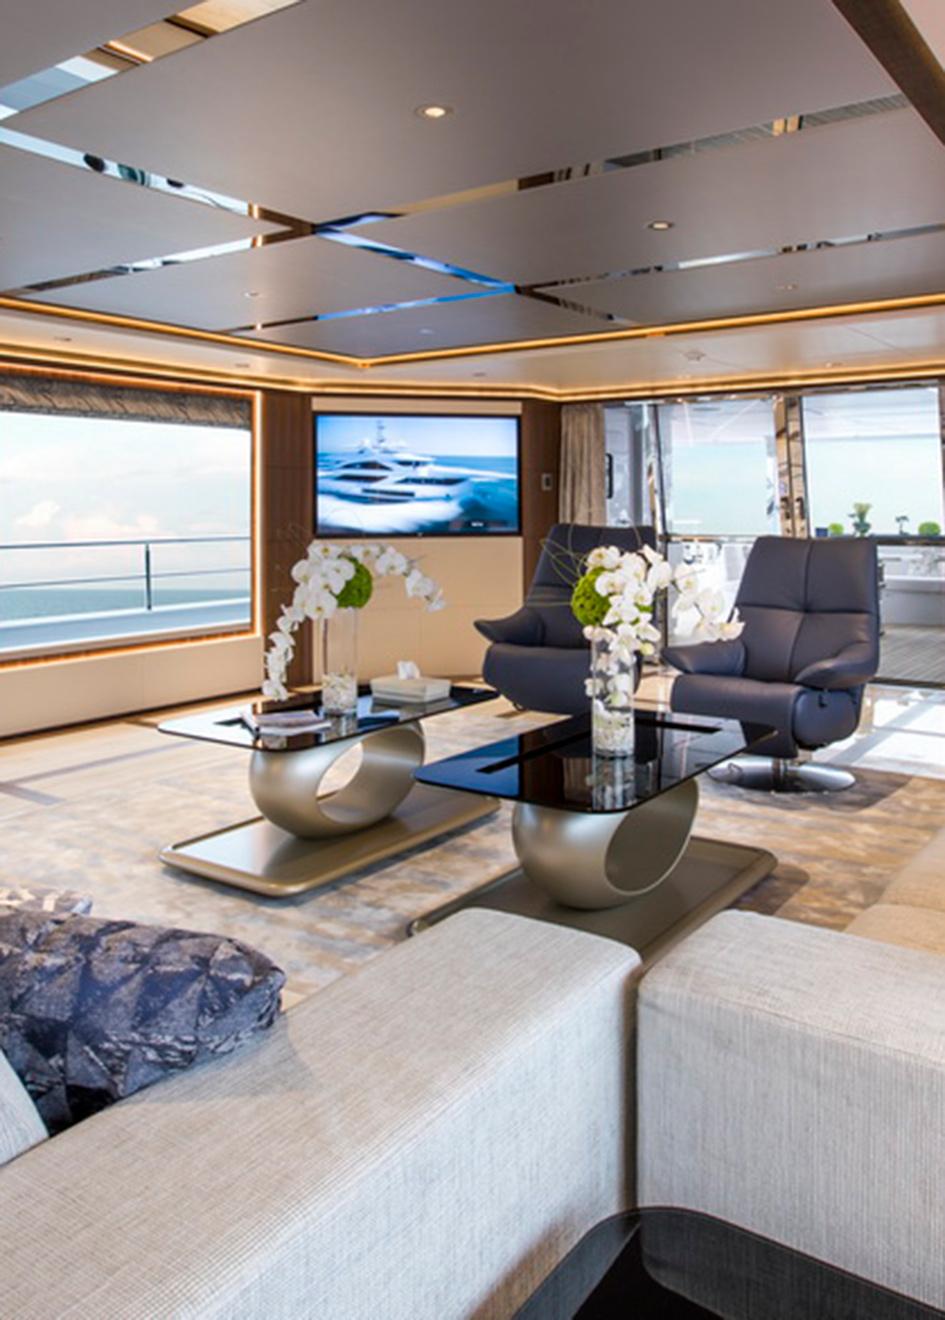 side-view-of-the-gulf-craft-majesty-140-yacht